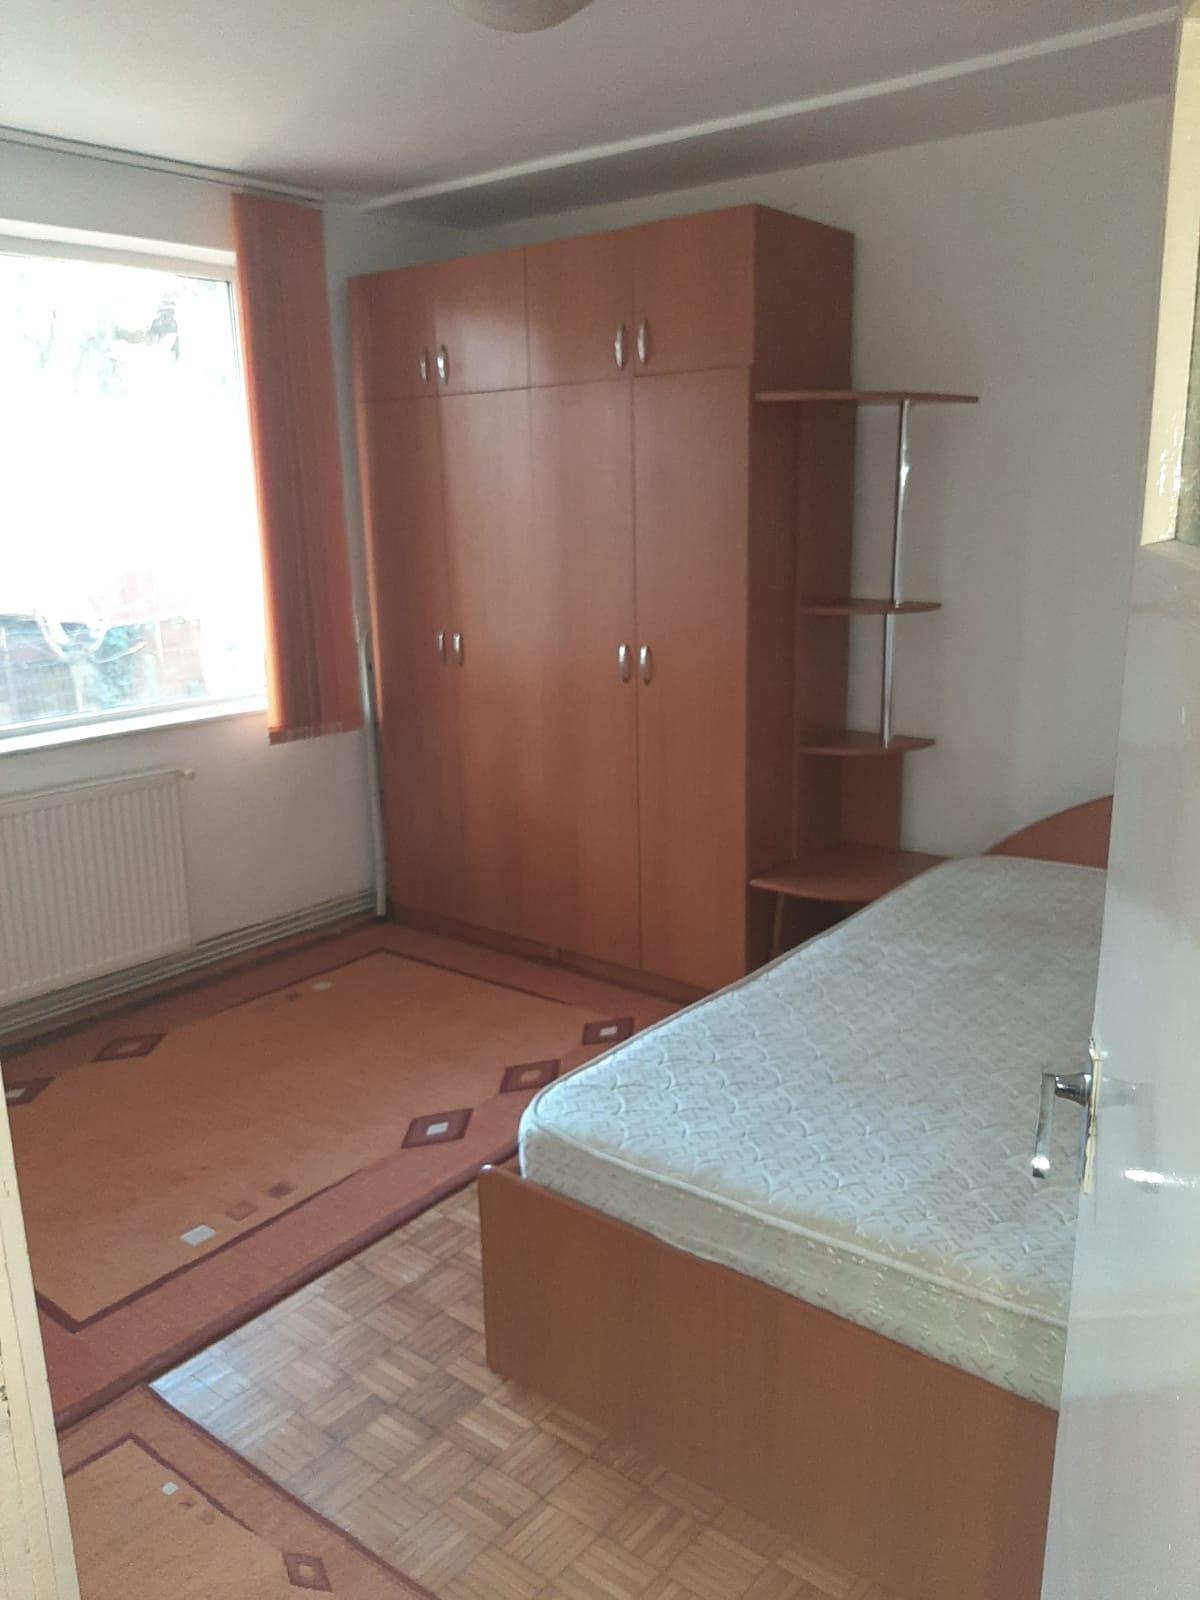 188134-Inchiriere apartament 2 camere, Grigorescu,Cluj-Napoca